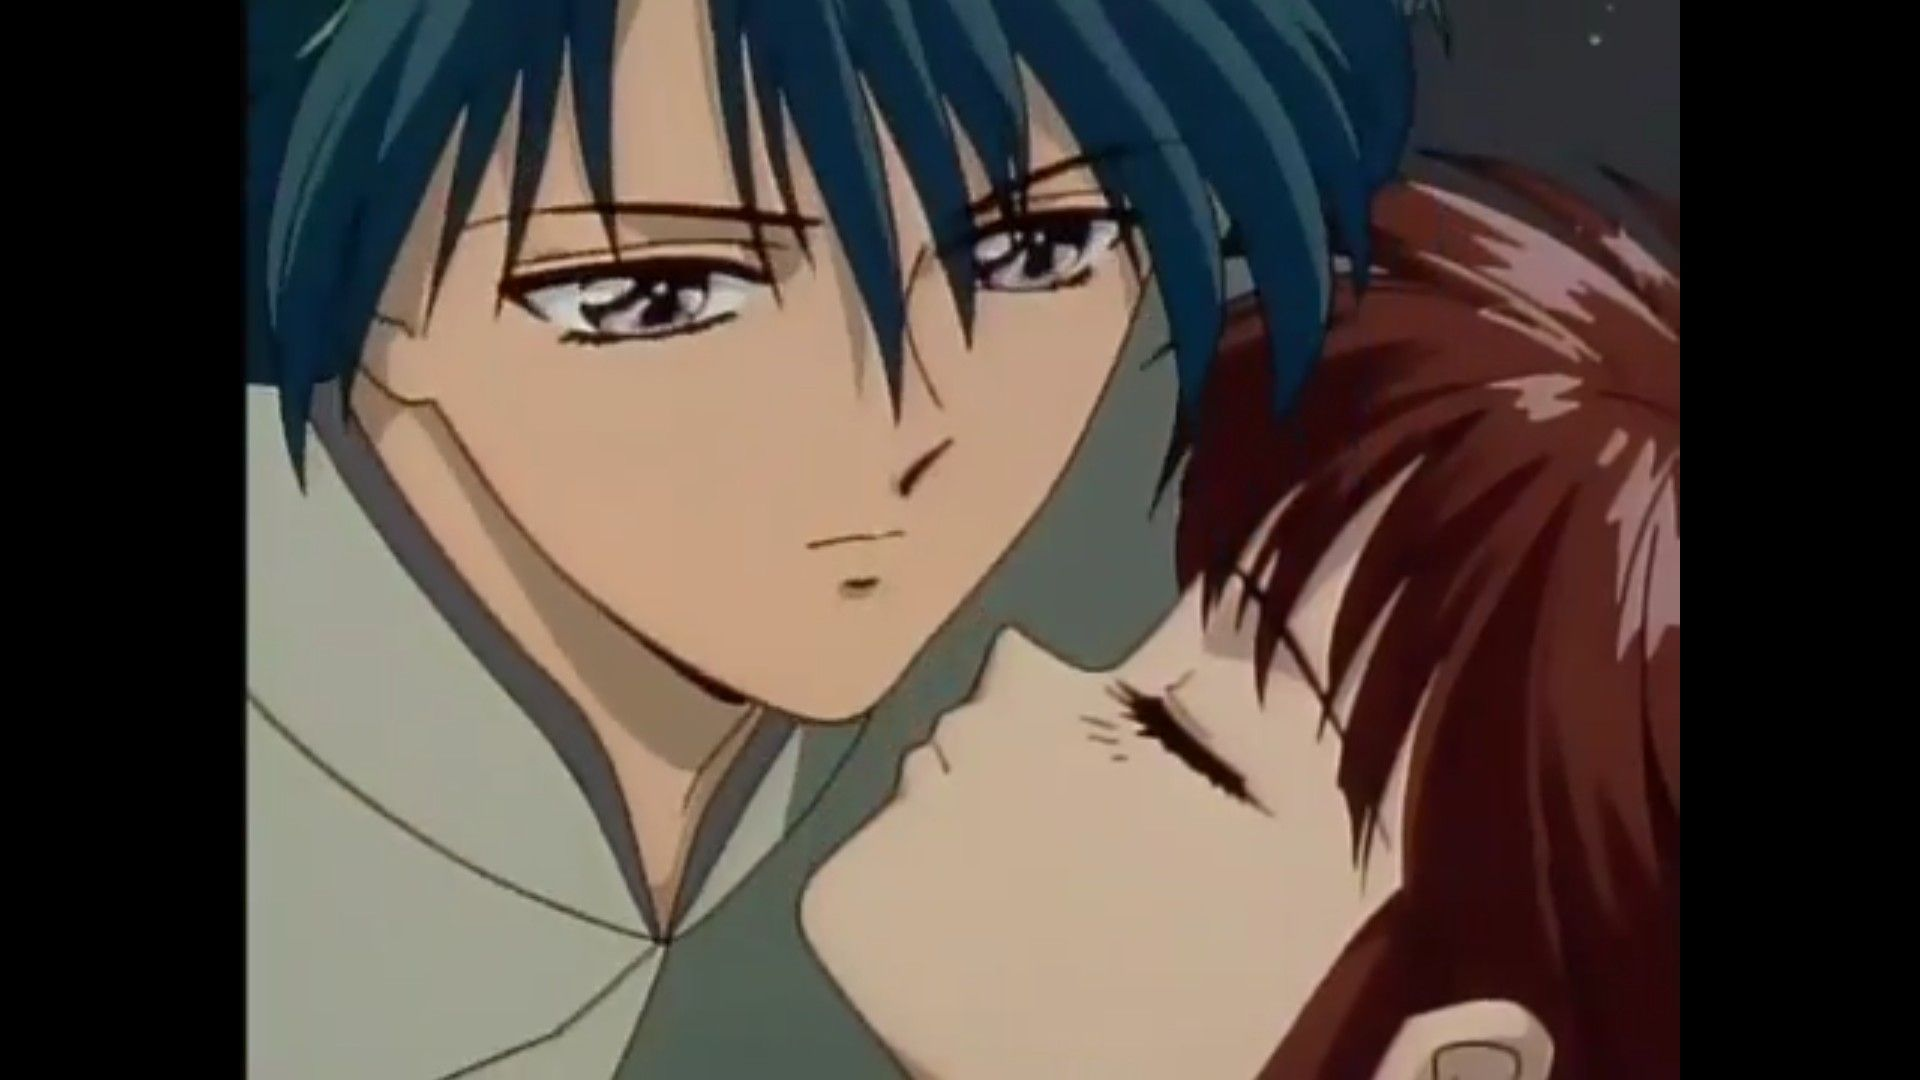 """Miaka,stay well my love""Tamahome Anime, Martial arts"